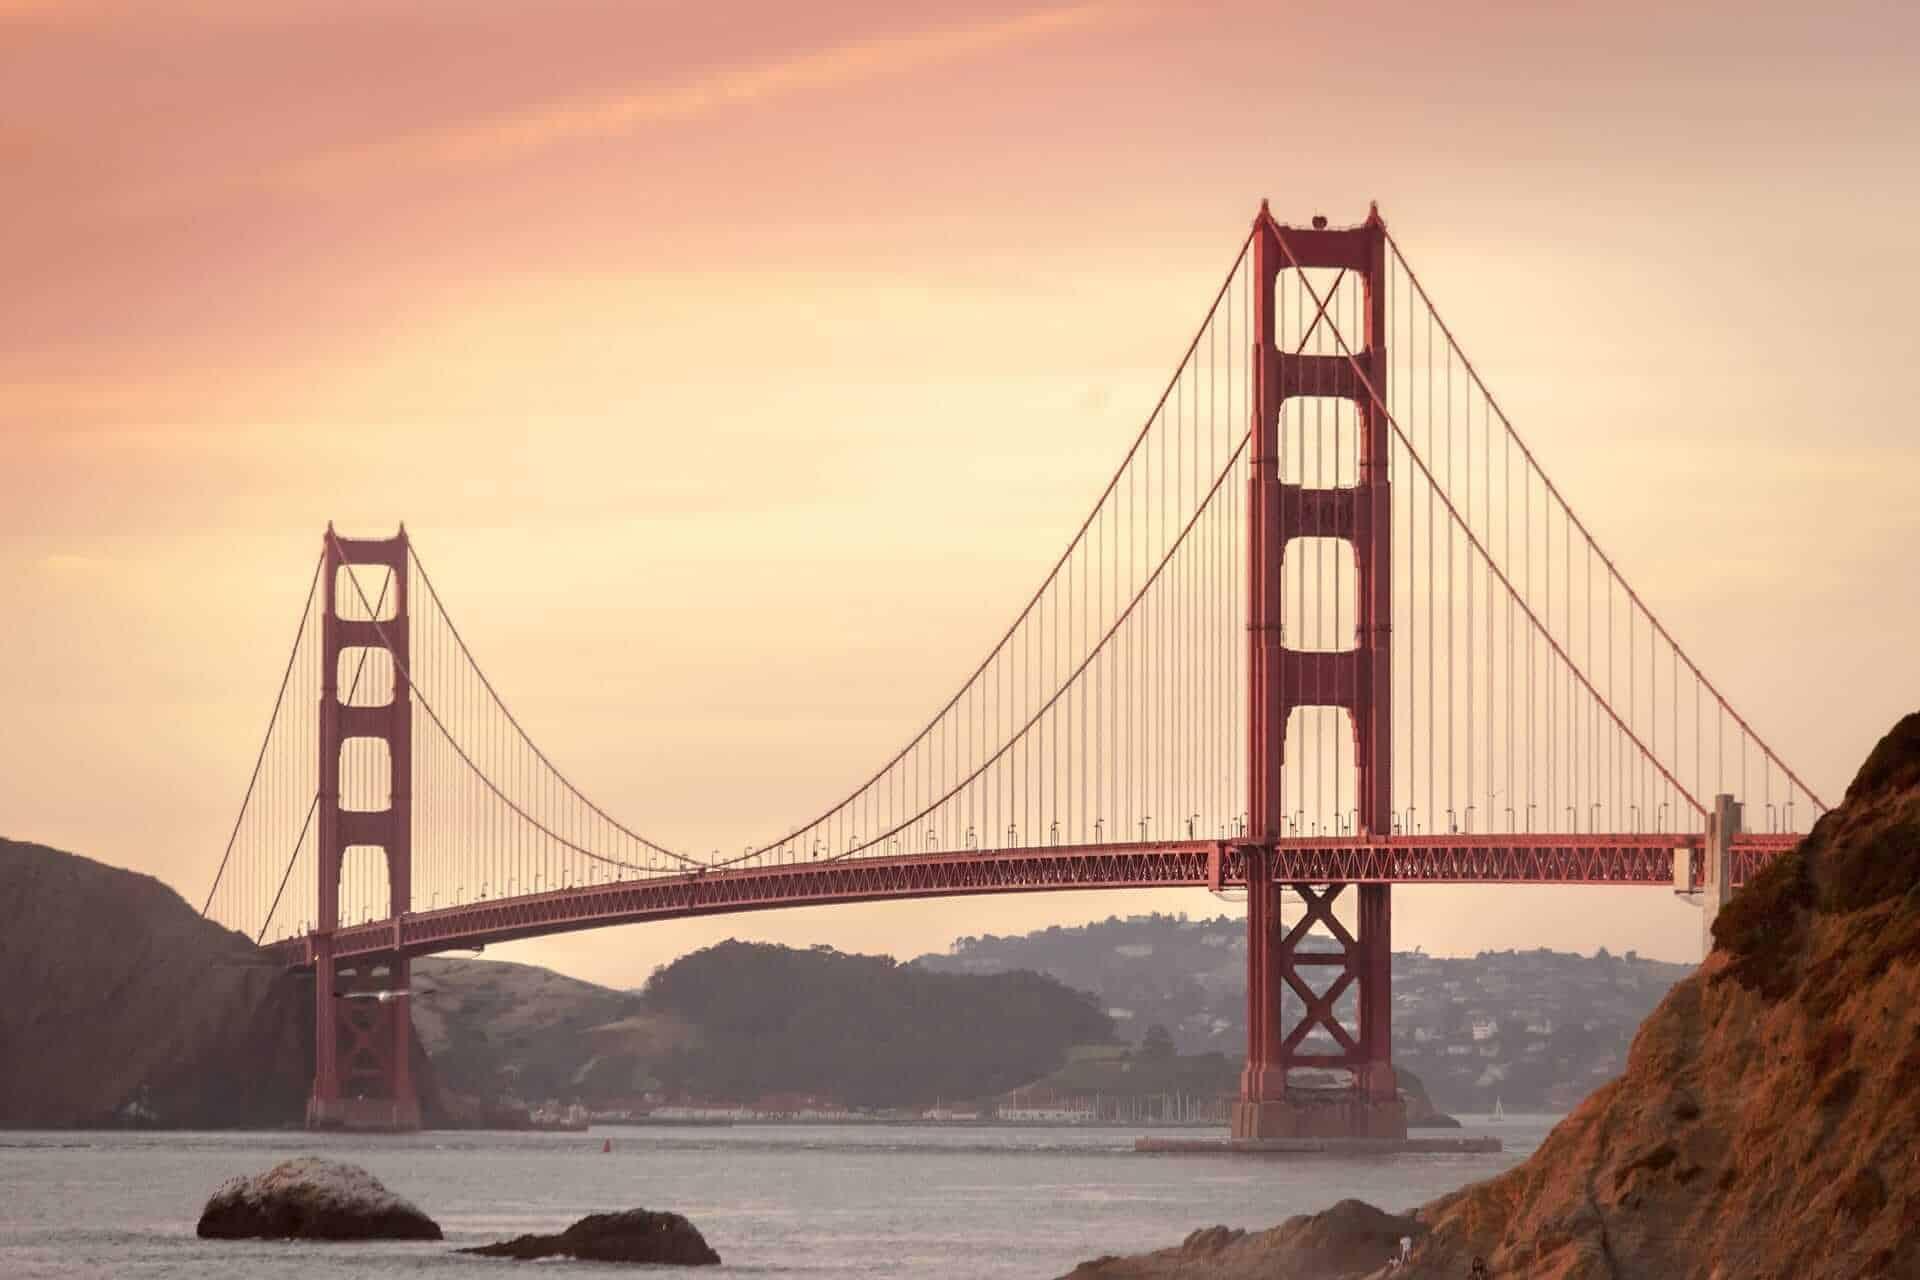 The Golden Gate Bridge. San Francisco